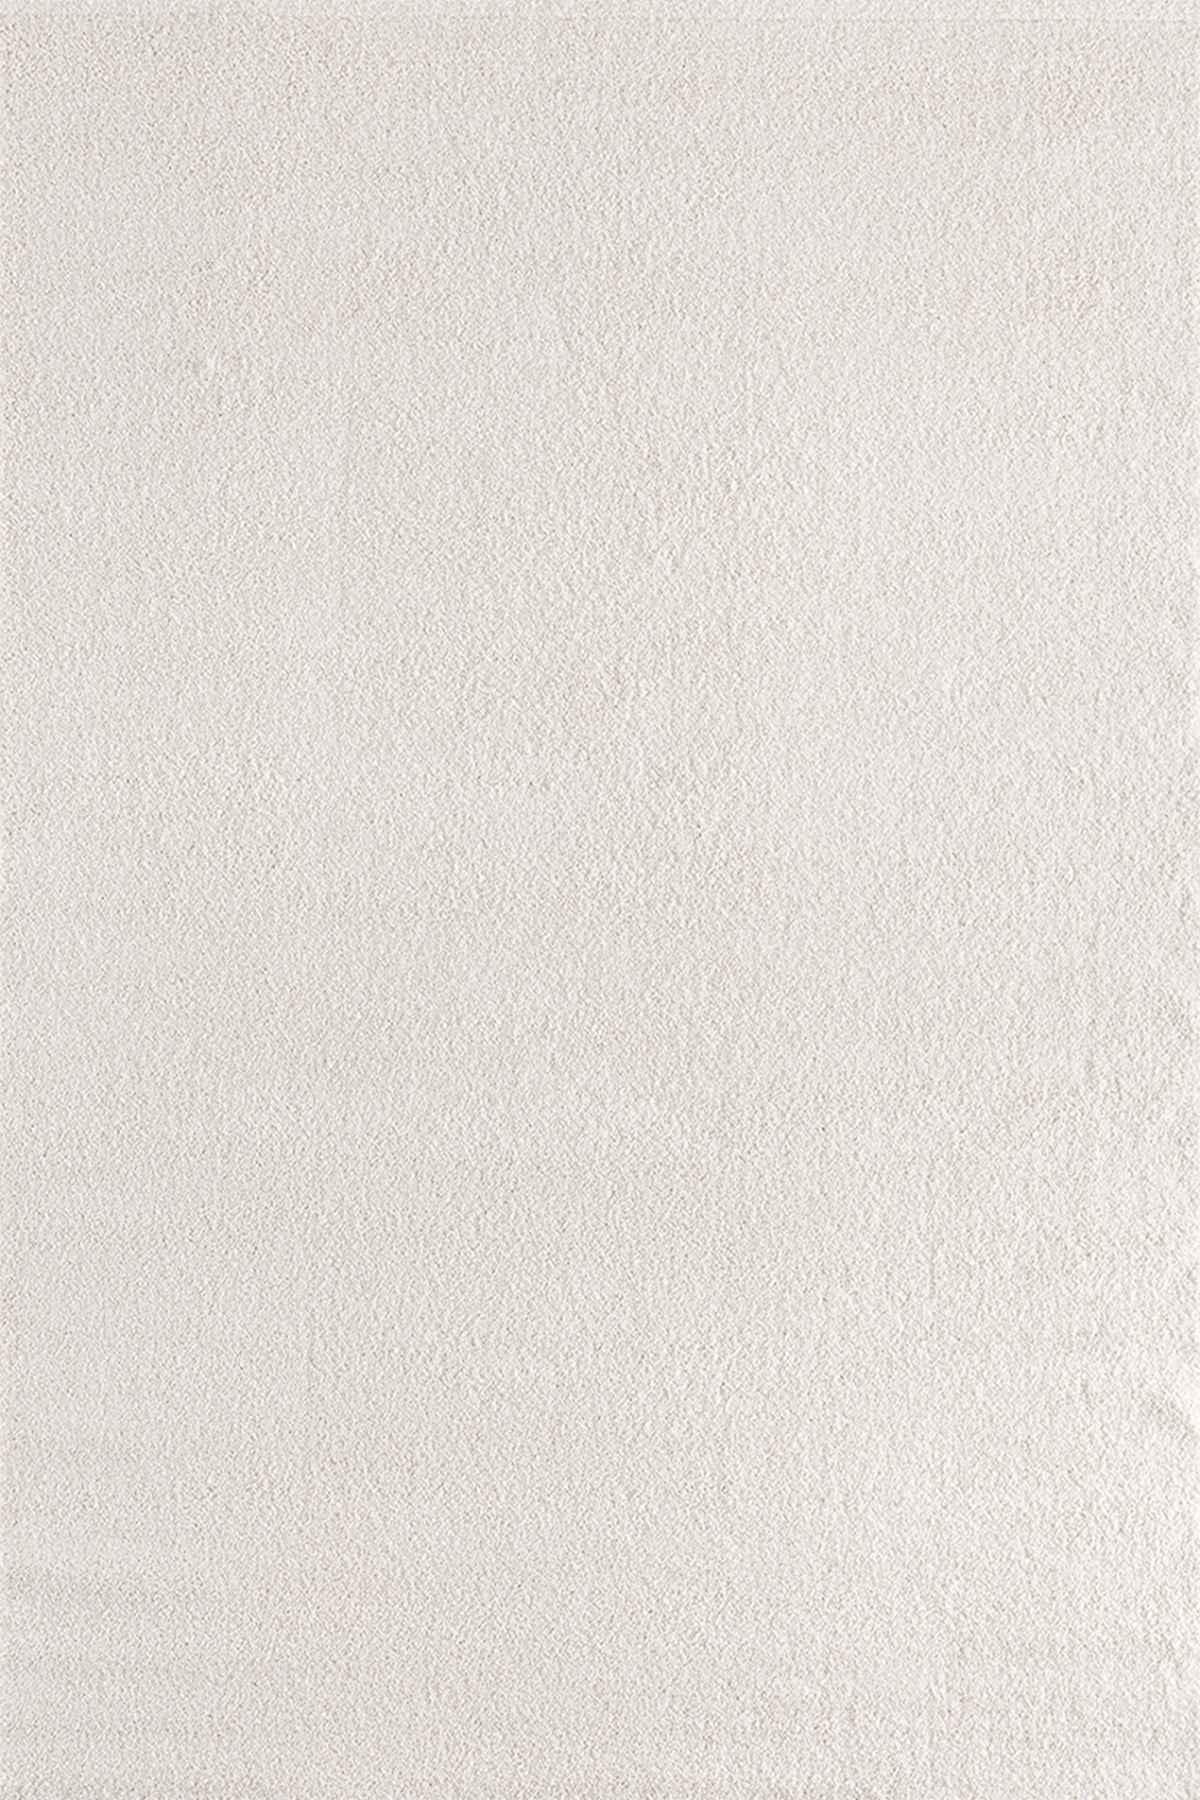 Tuval Halı  Süpersoft 3849 Beyaz